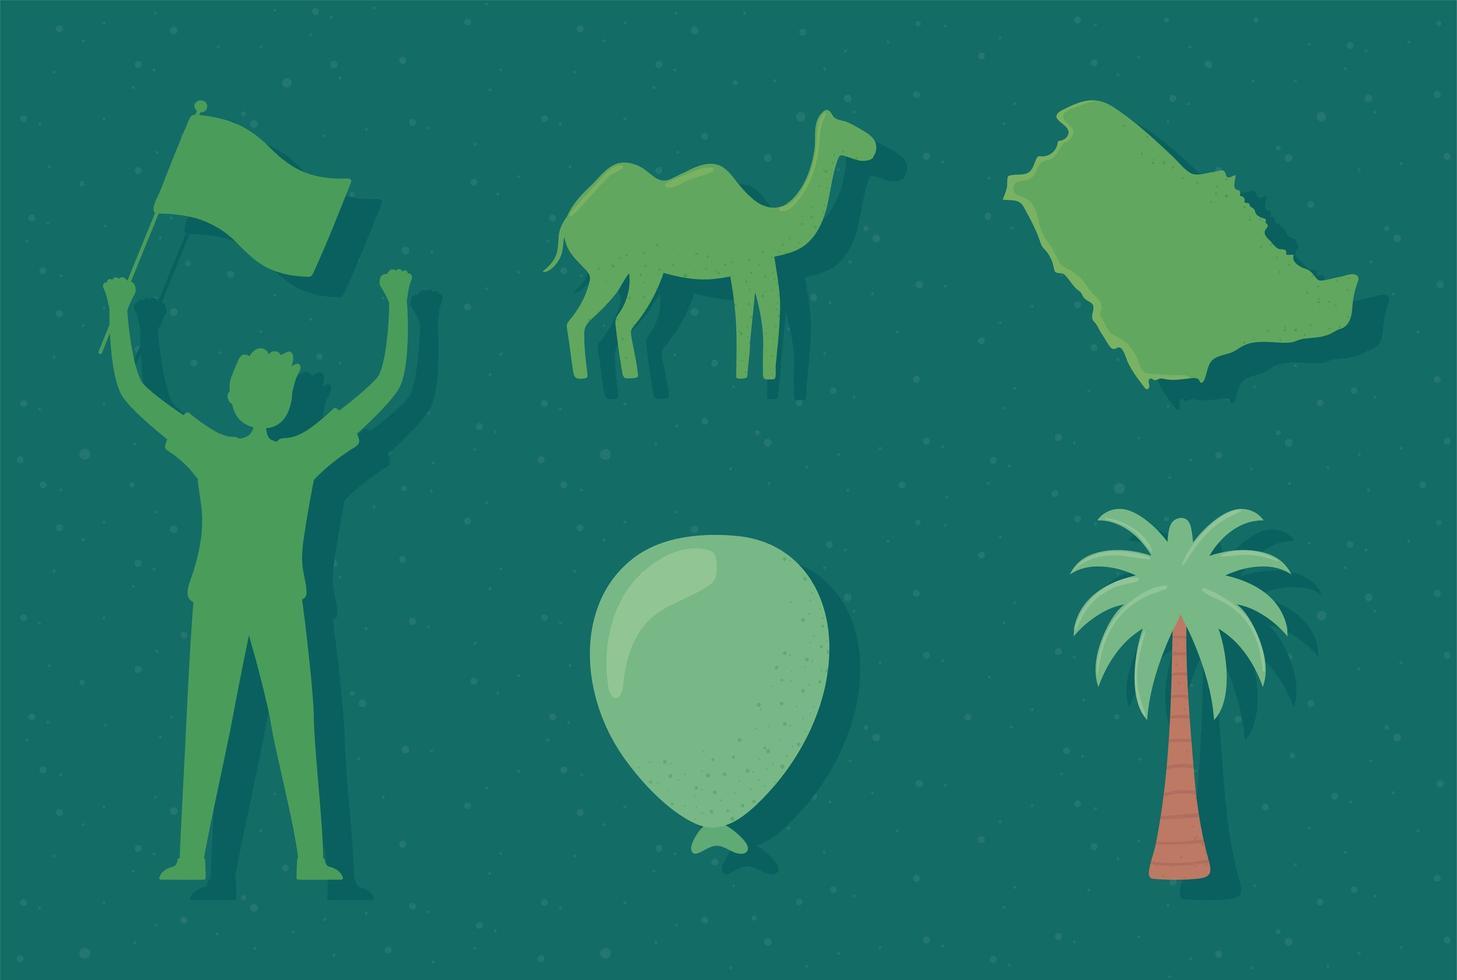 silhueta verde arábia saudita vetor